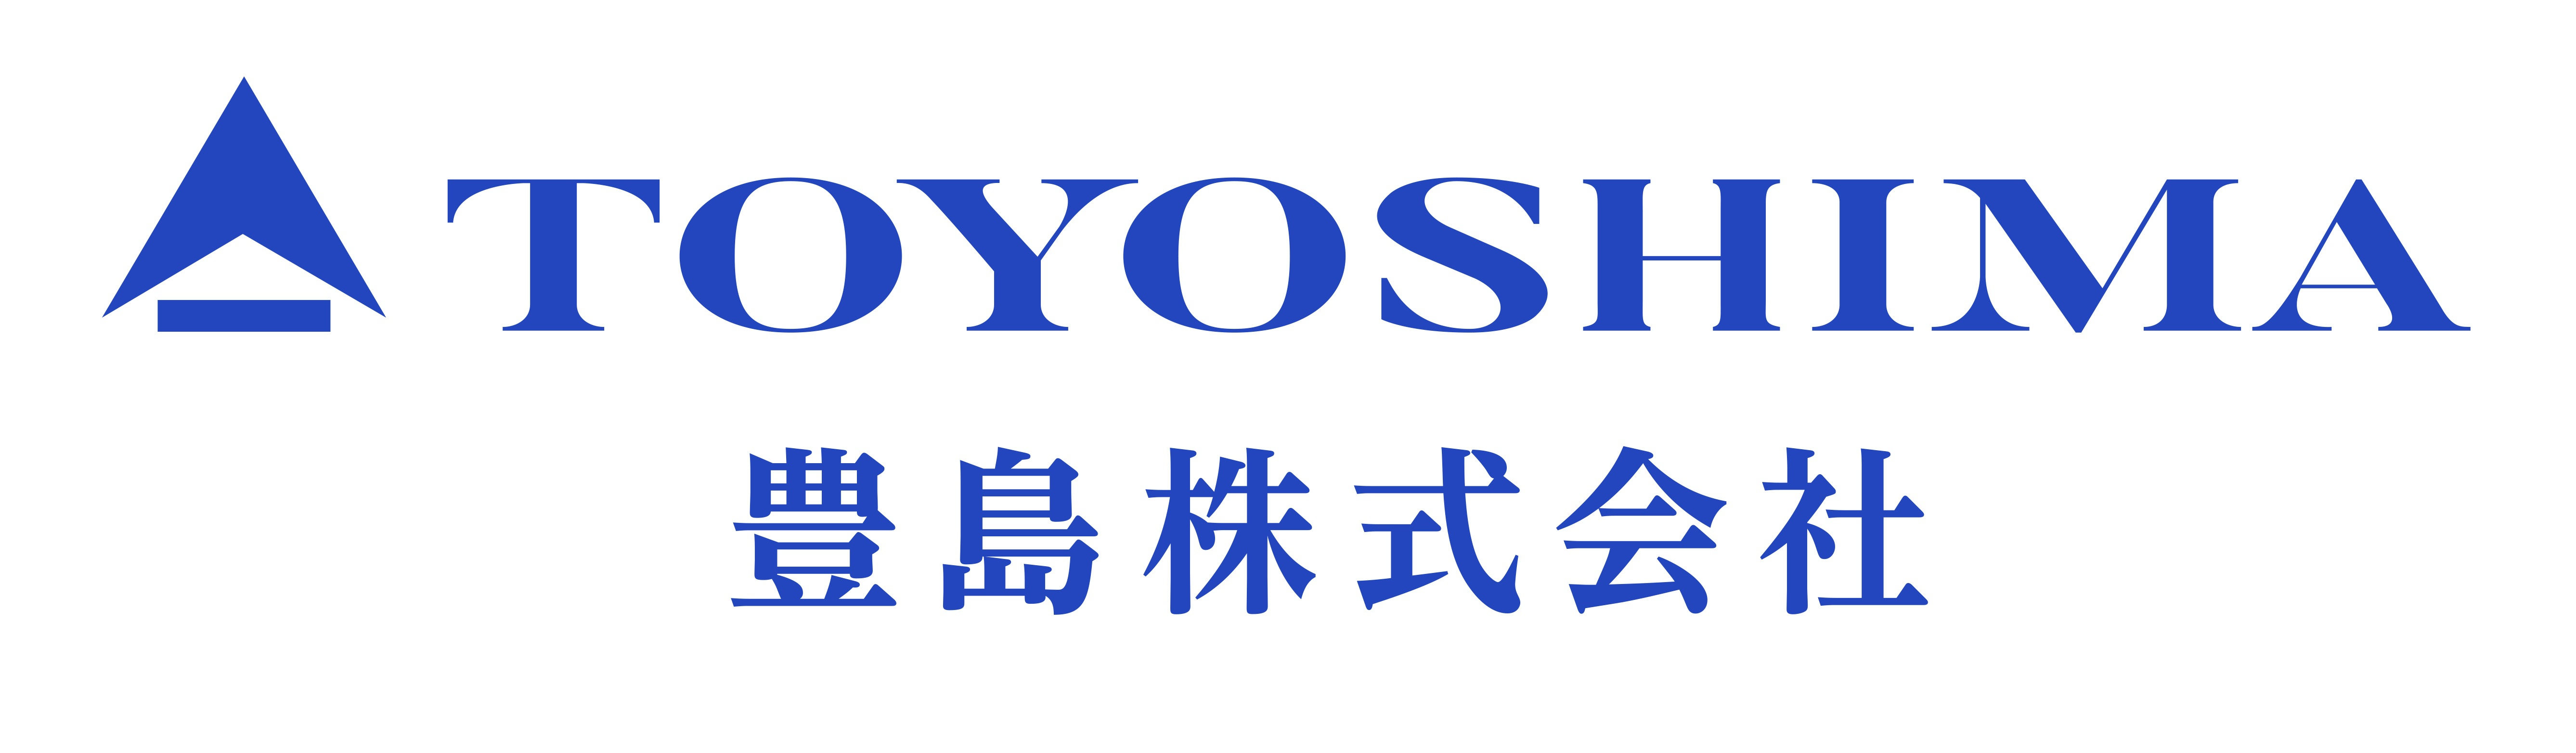 豊島株式会社ロゴ